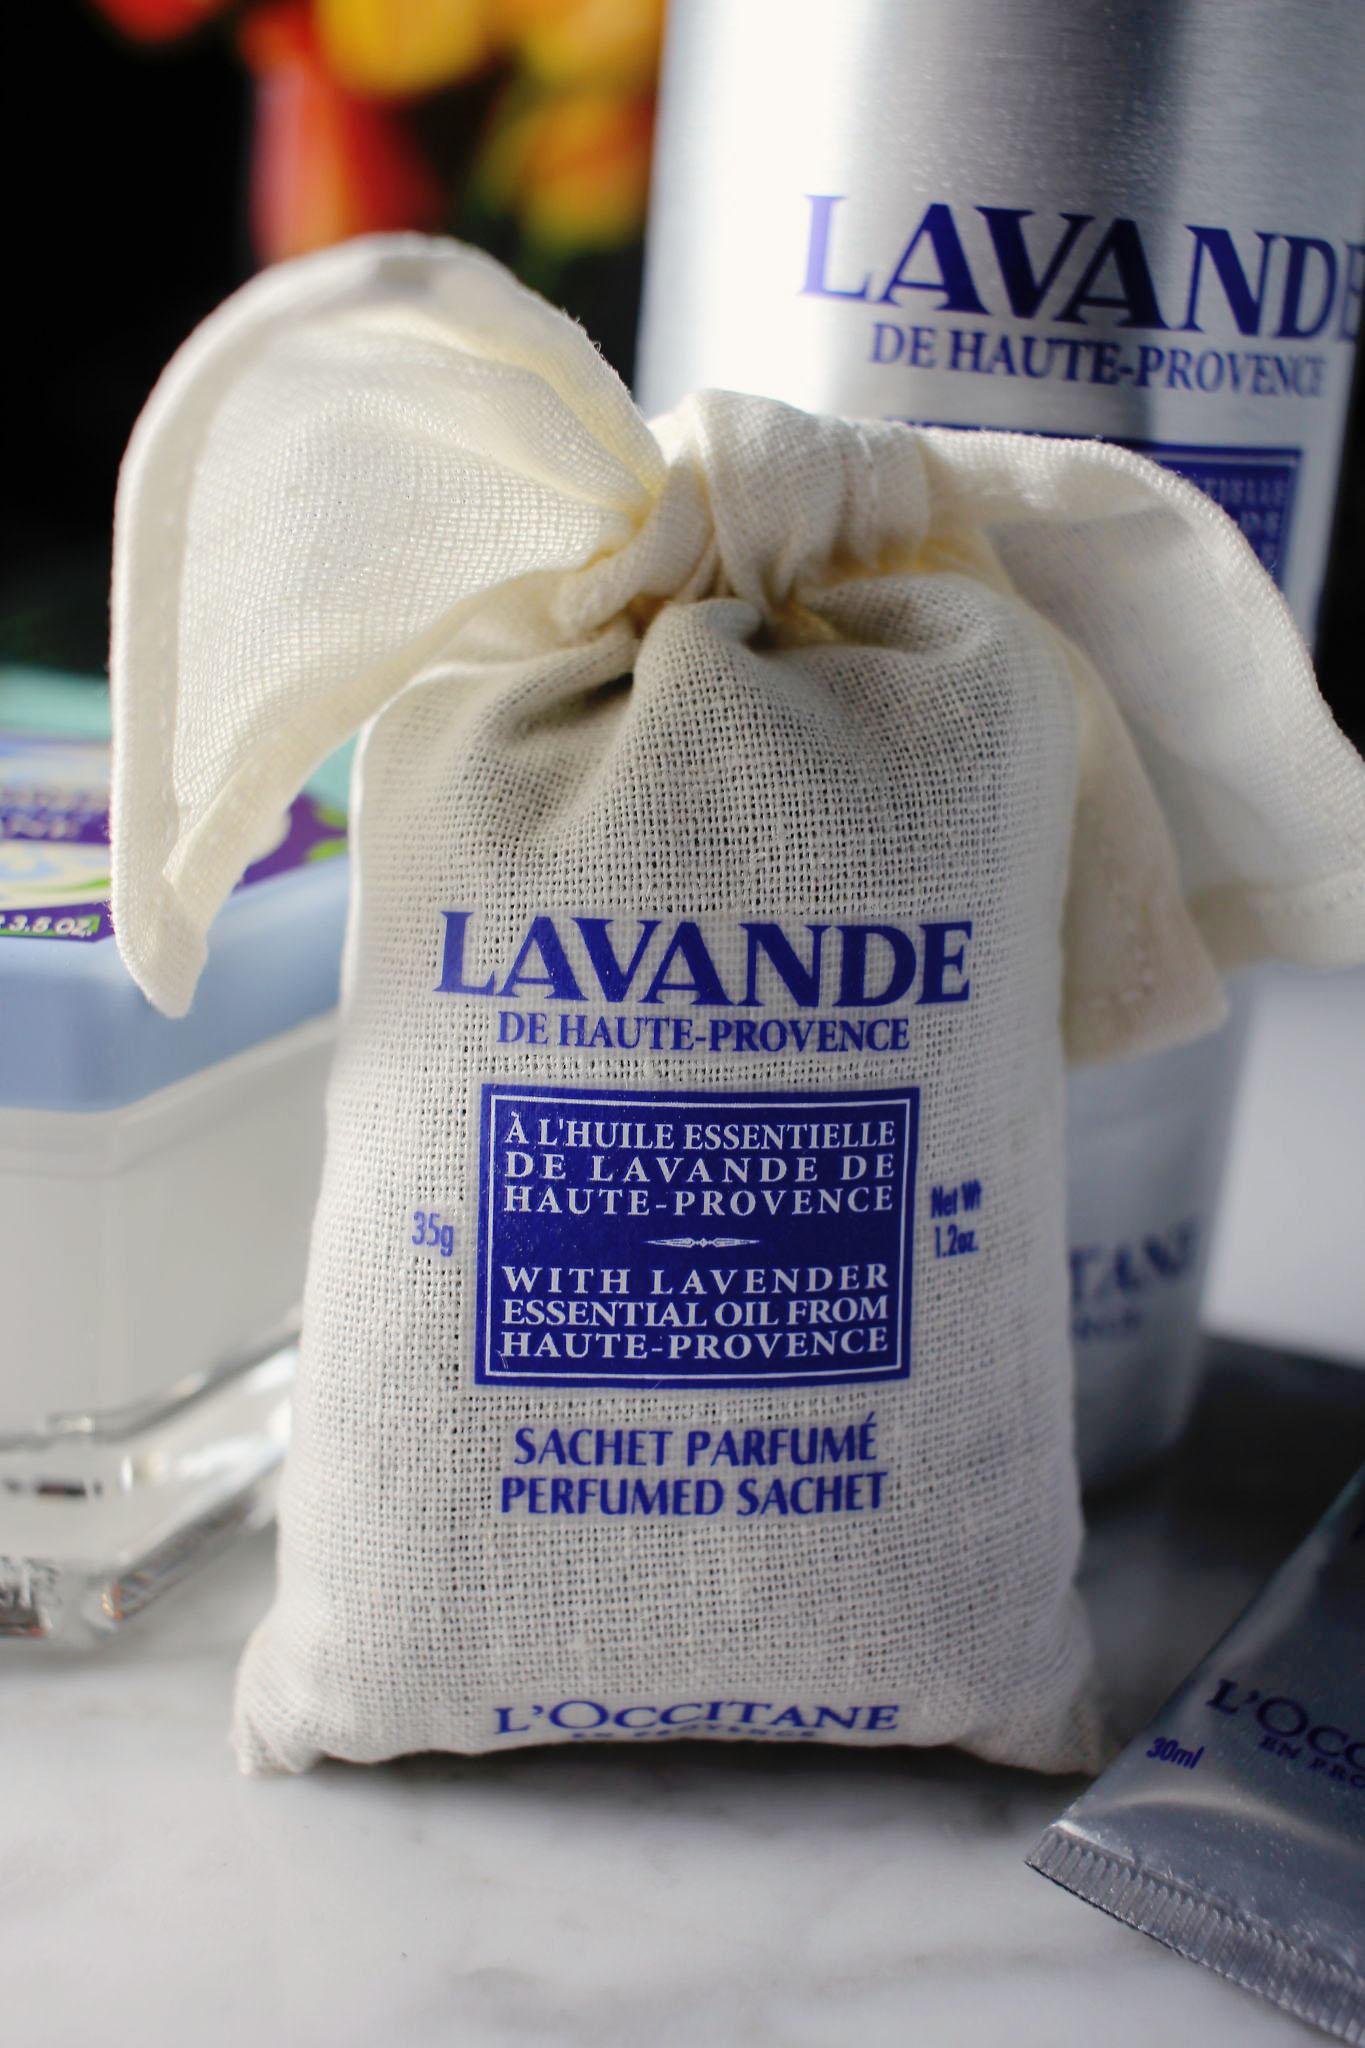 L'Occitane Lavender Perfume Satchet